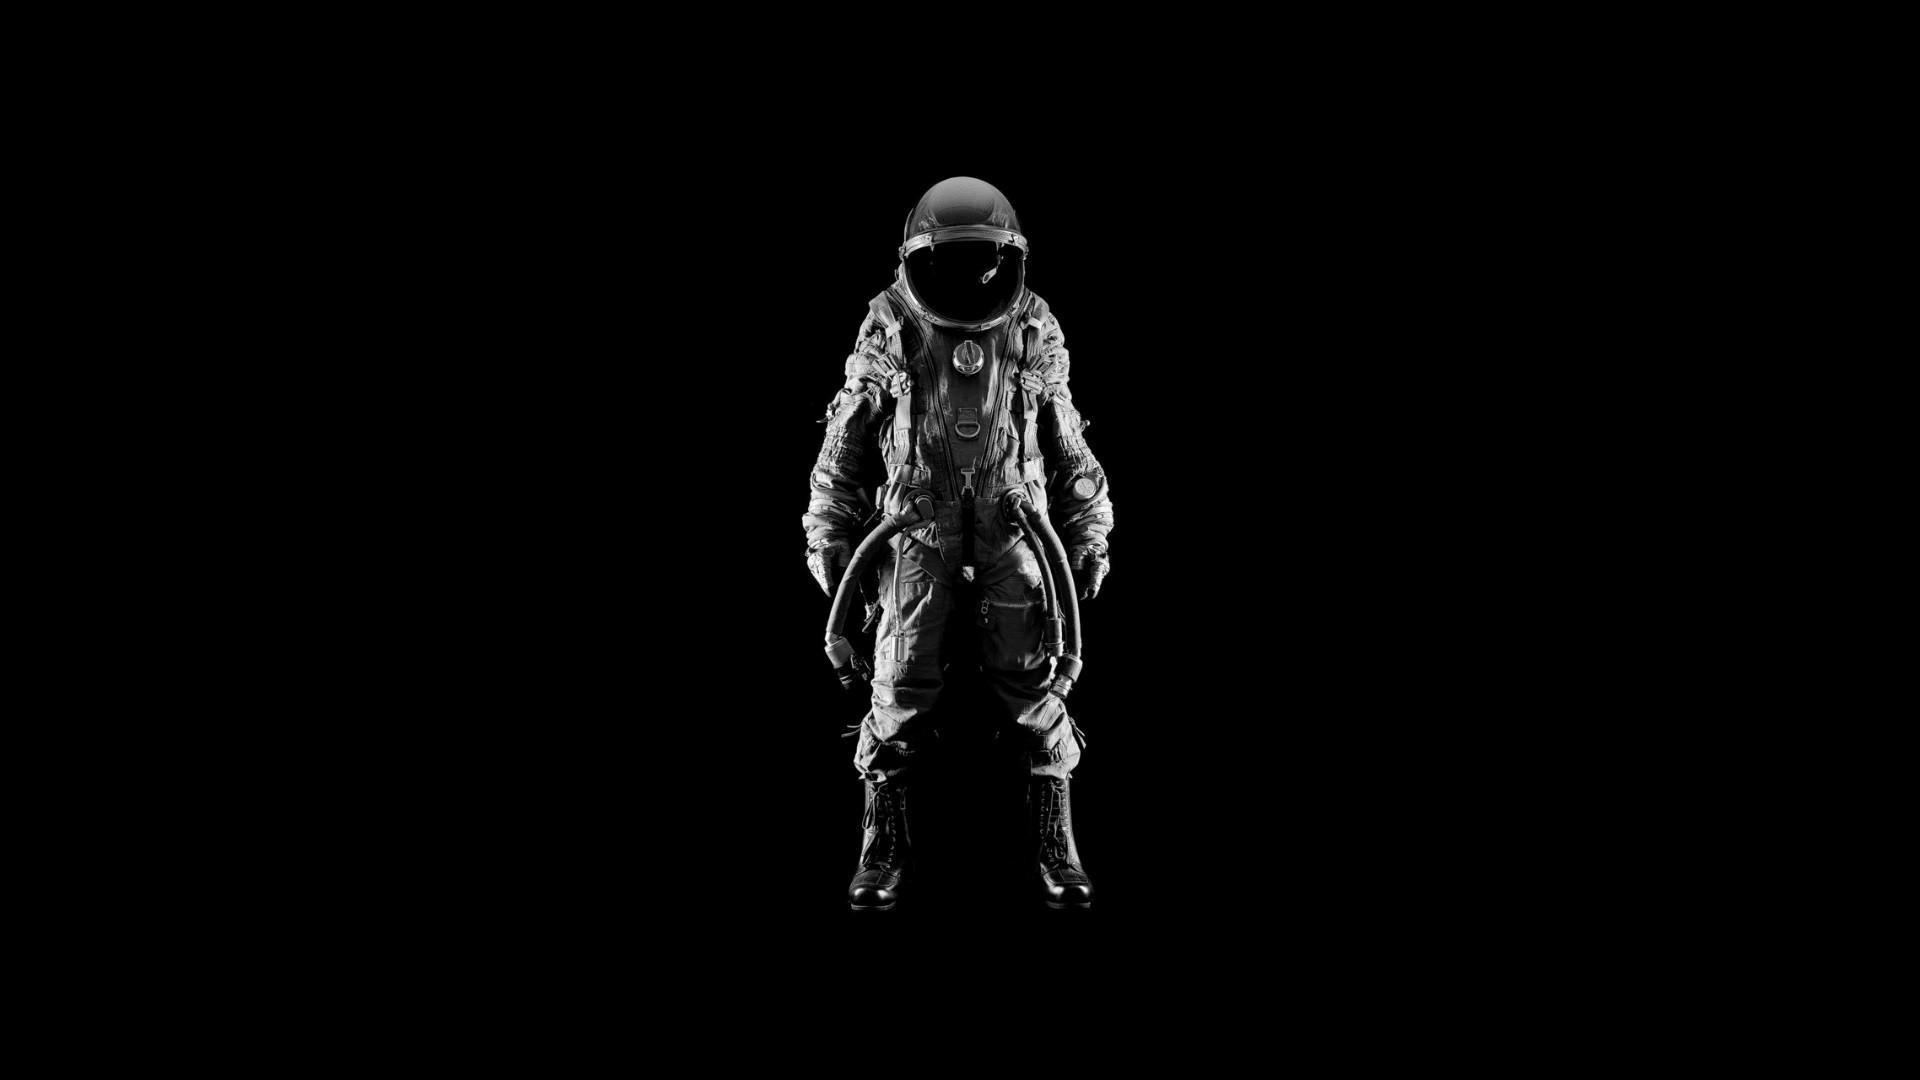 wallpaper.wiki-HD-Astronaut-Photo-PIC-WPD005895